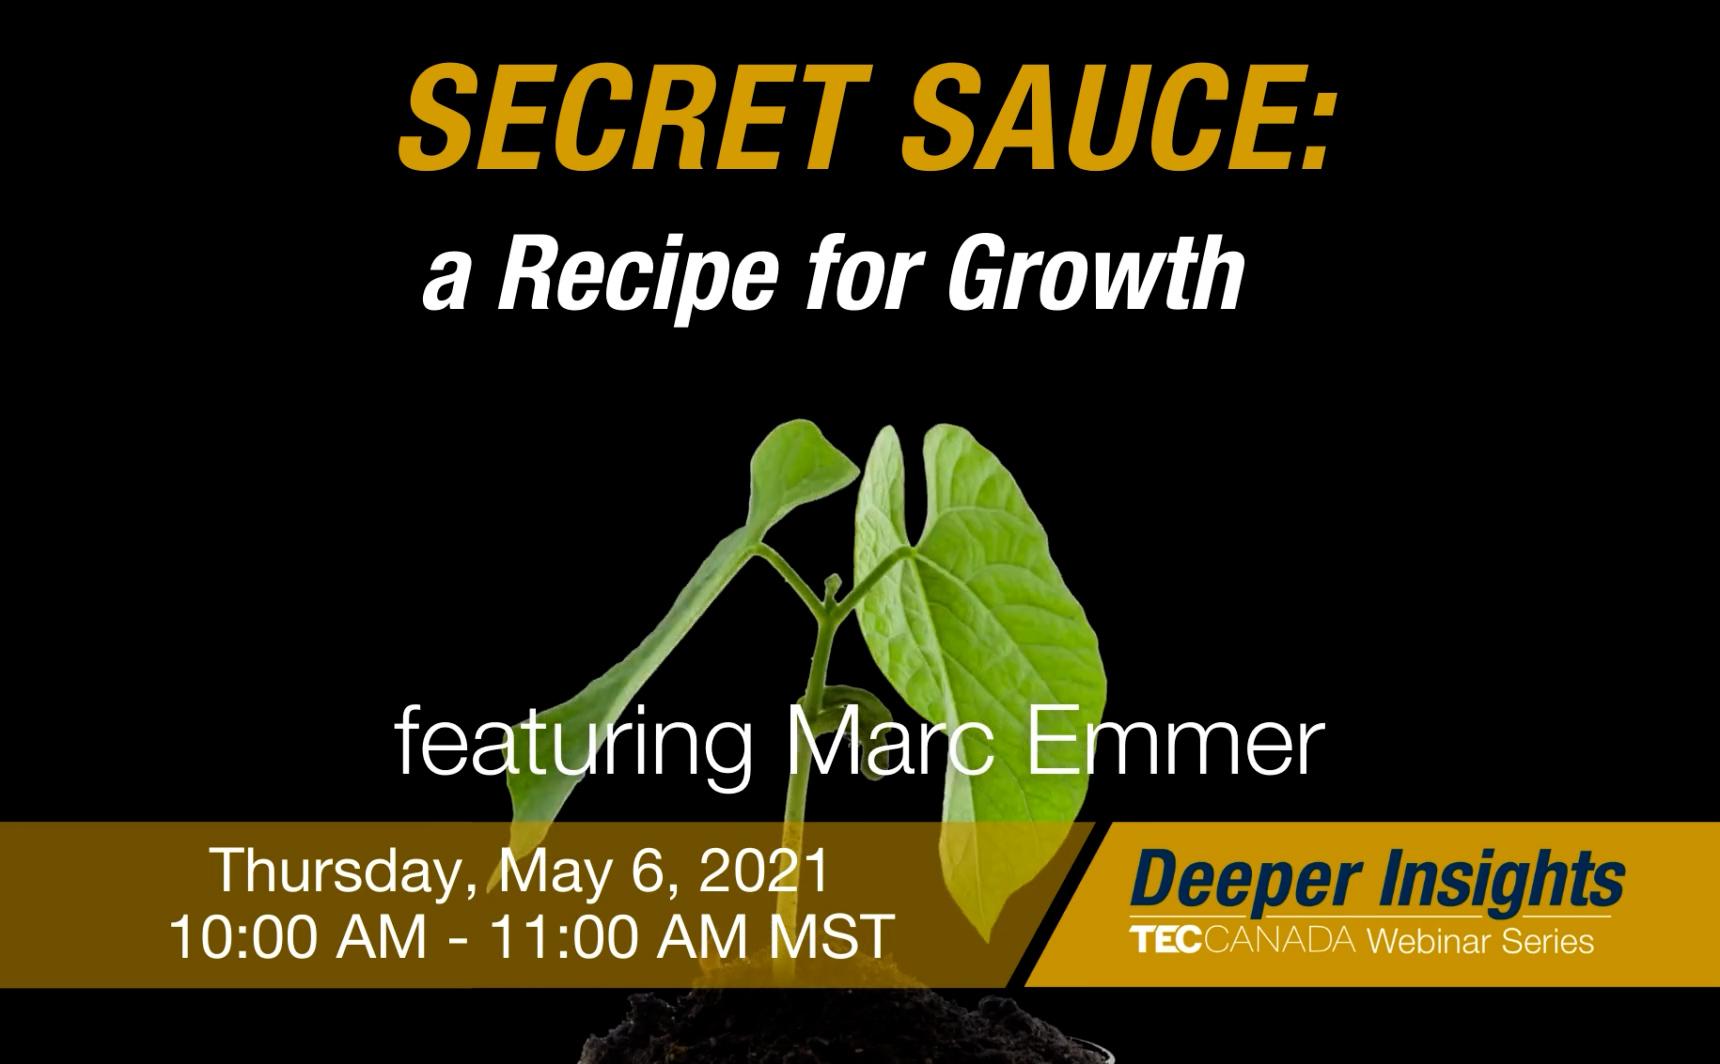 Secret Sauce: A Recipe For Growth